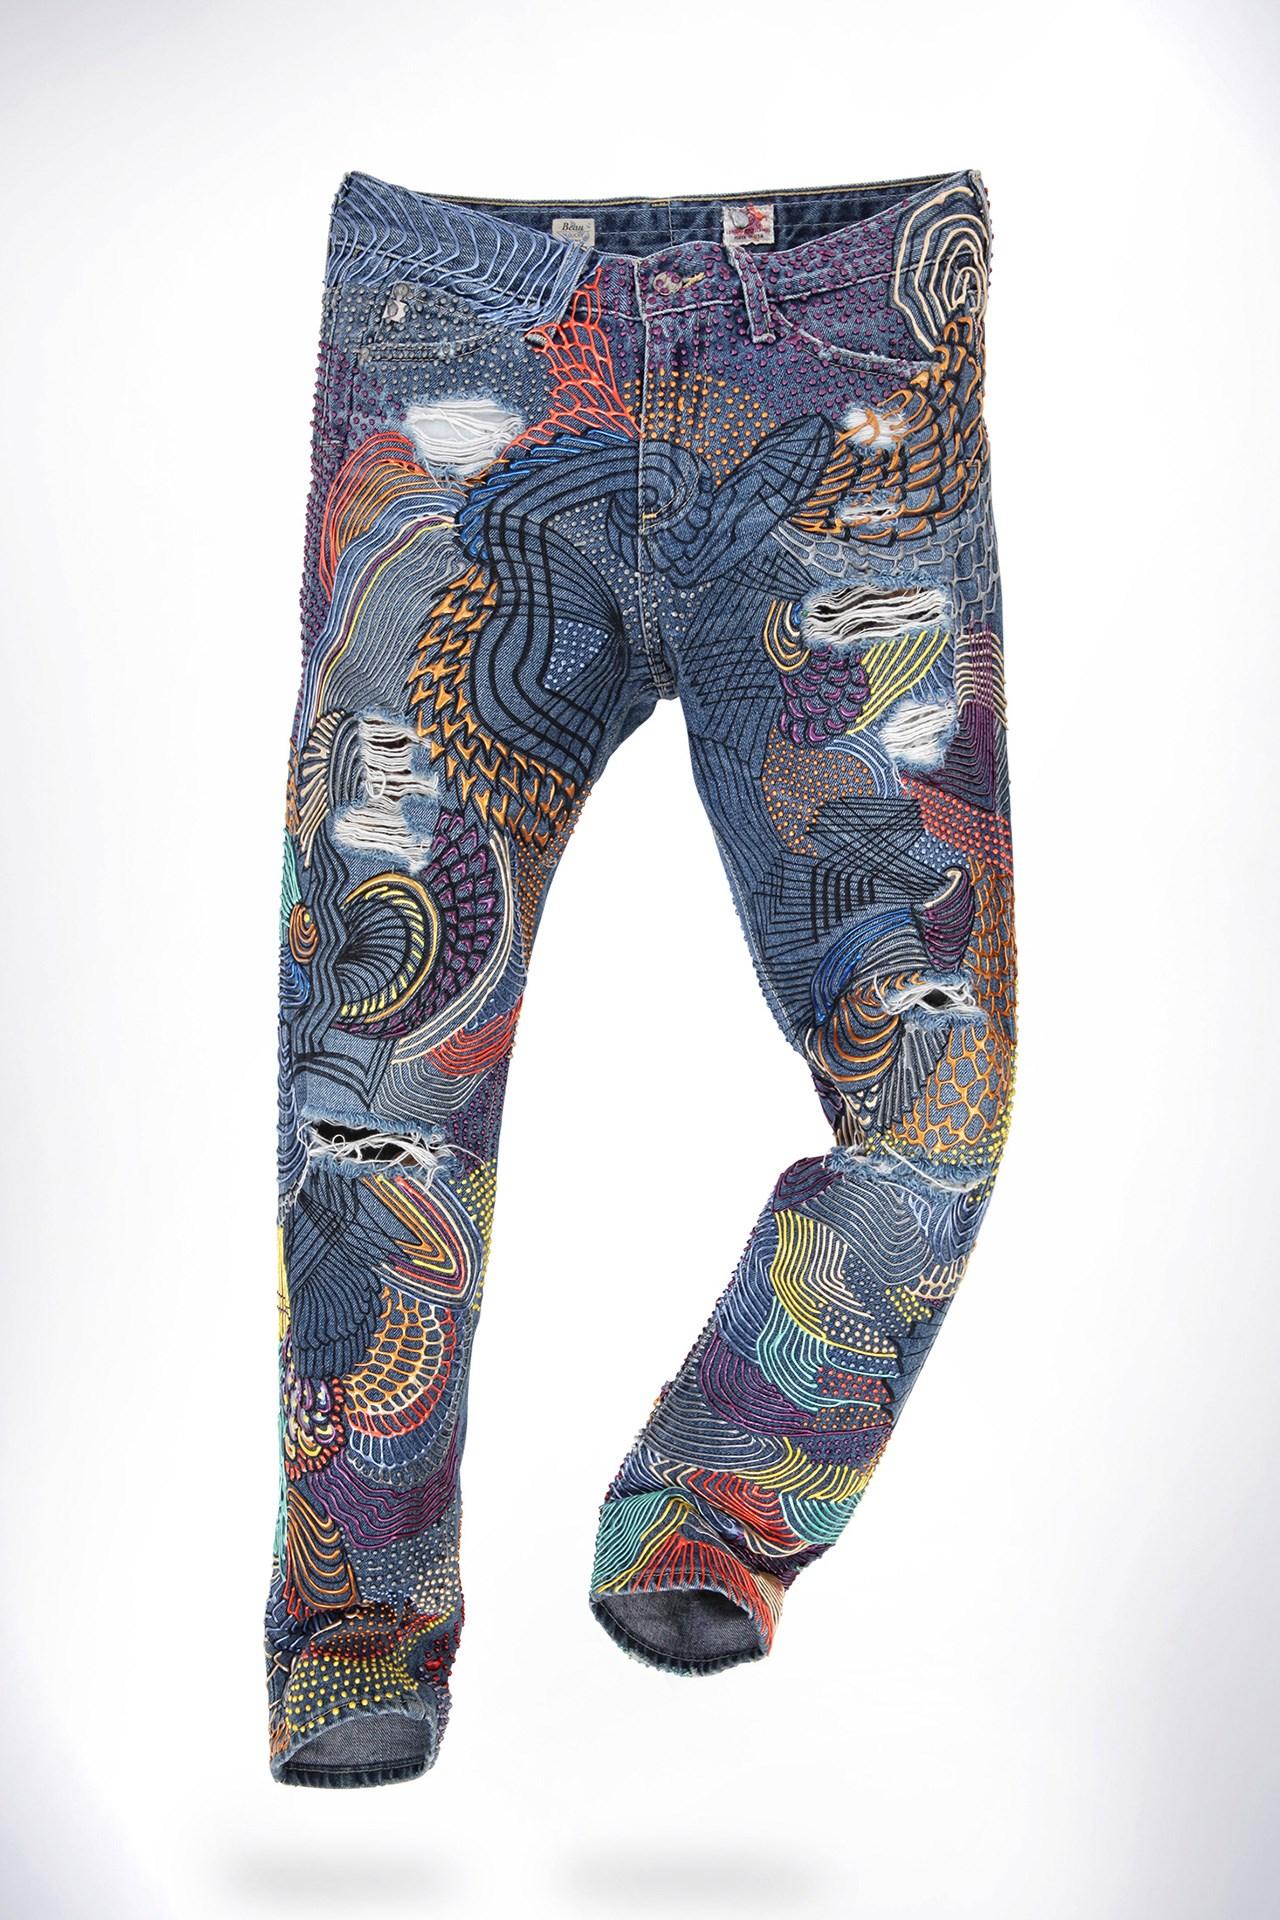 Emma Watson's customized jeans by Johny Dar.